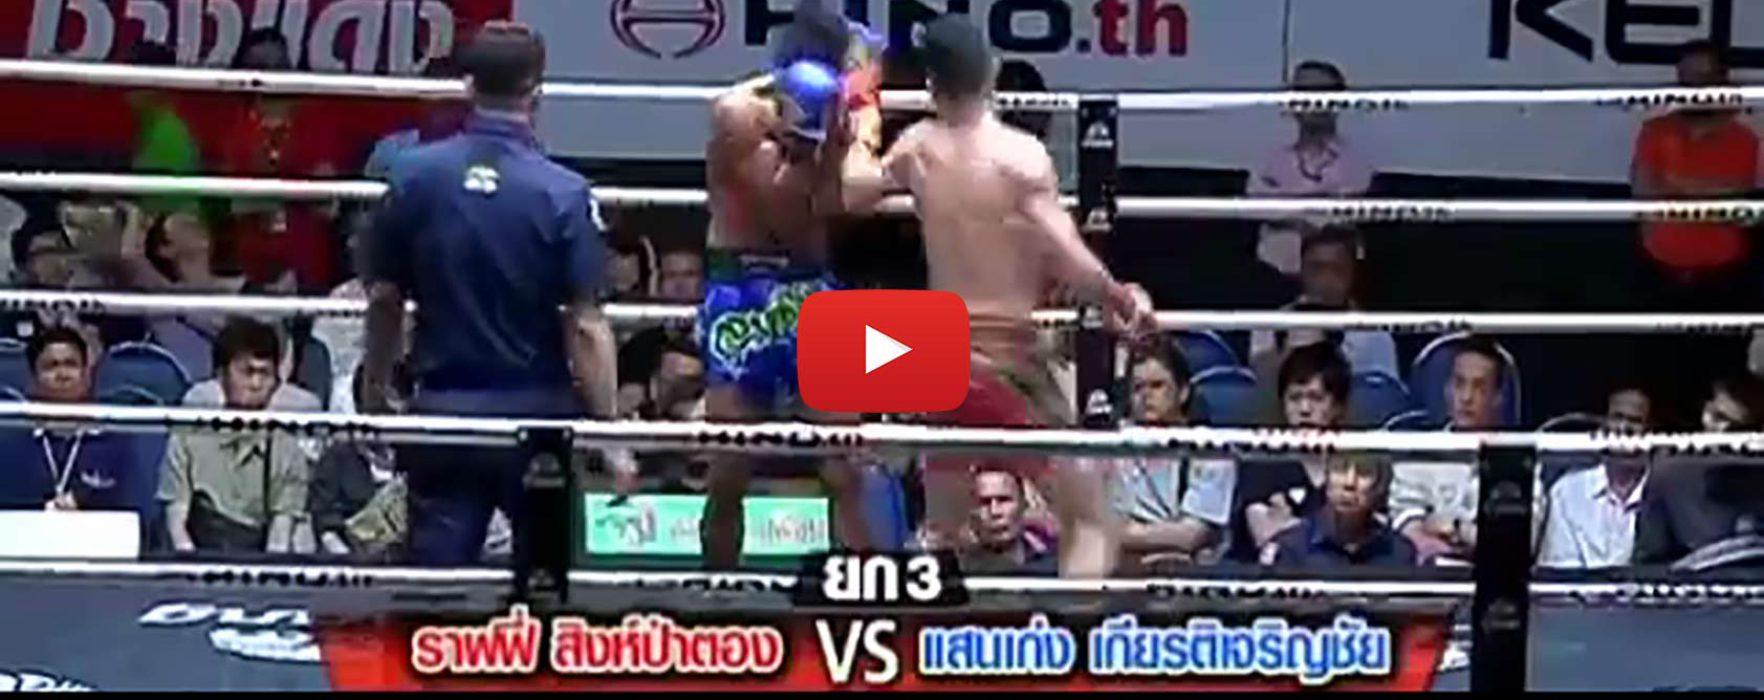 (English) Video: Rafi Bohic defeats Senkeng Kiatjaroenchai by KO at Lumpinee Stadium – 3rd May 2016